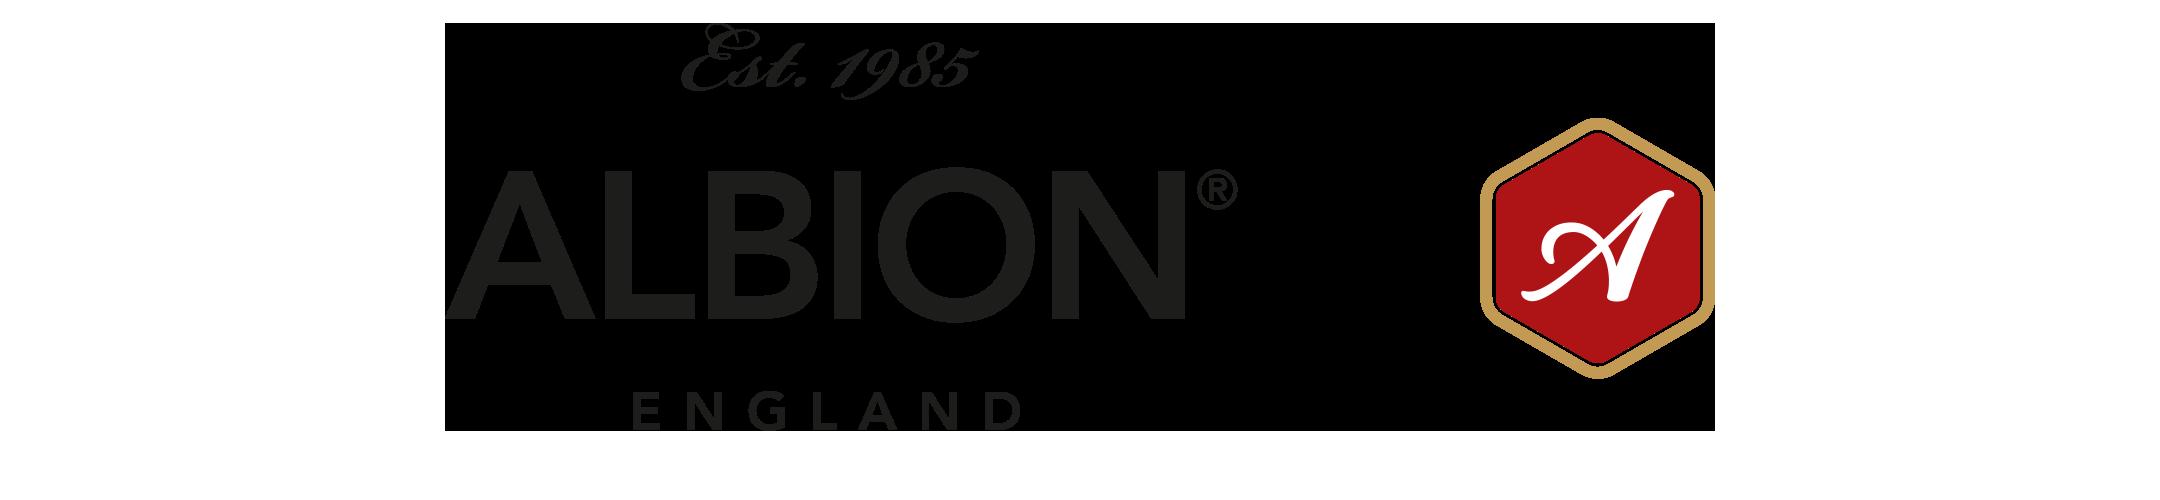 Branding, logo modernisation, packaging, textile design